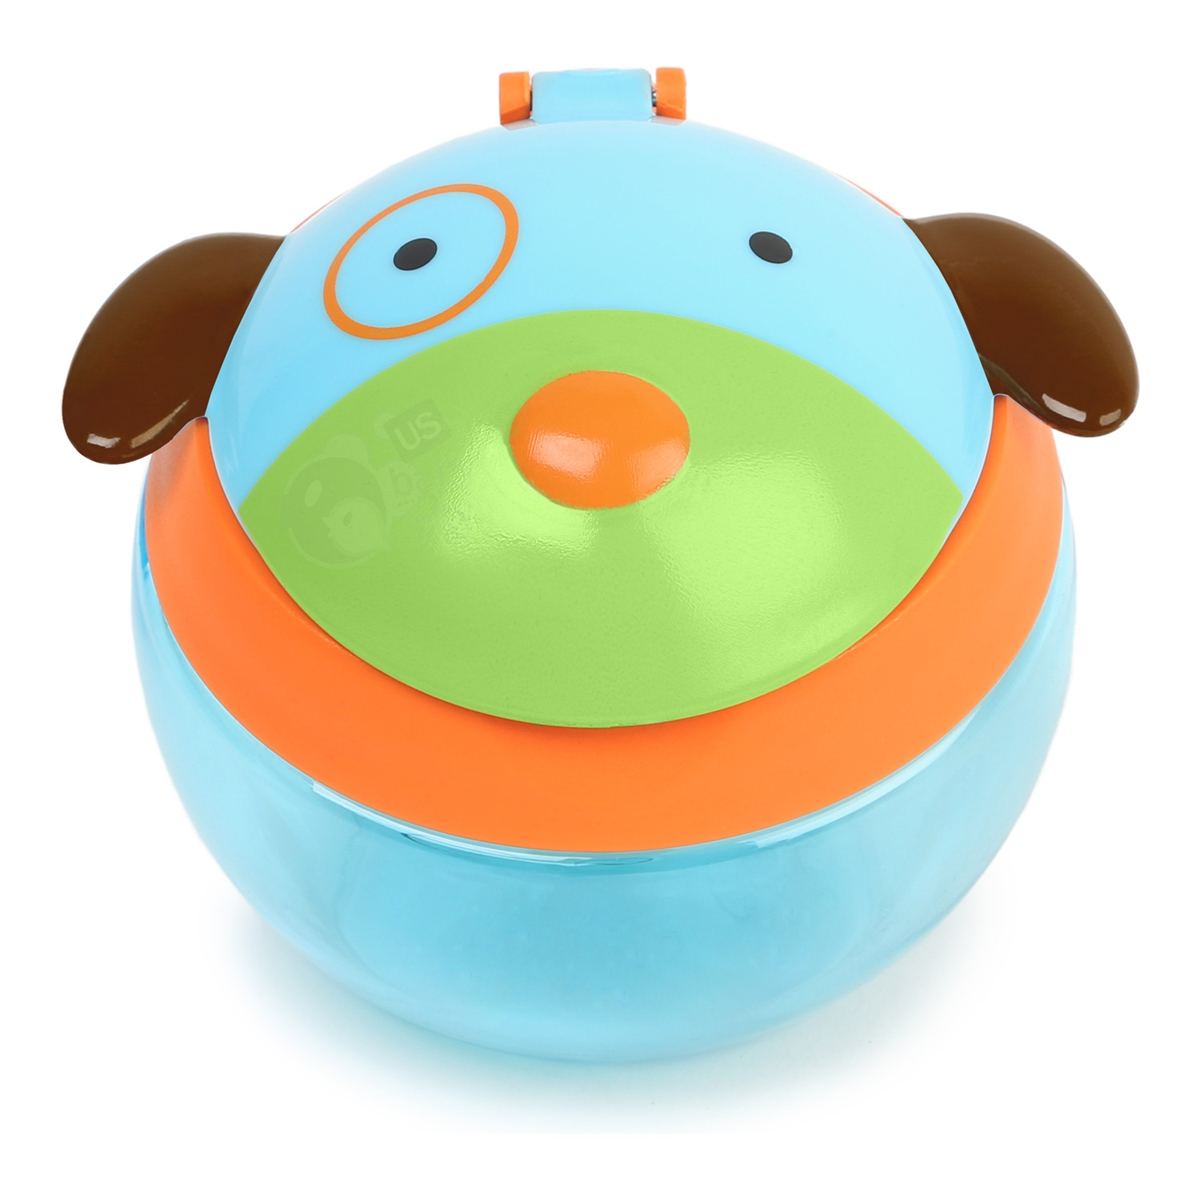 hop kneeler bath com safety mat pads skip from buy best reviews padstub kneeling mats easy amazon baby deluxe tub aquatopia